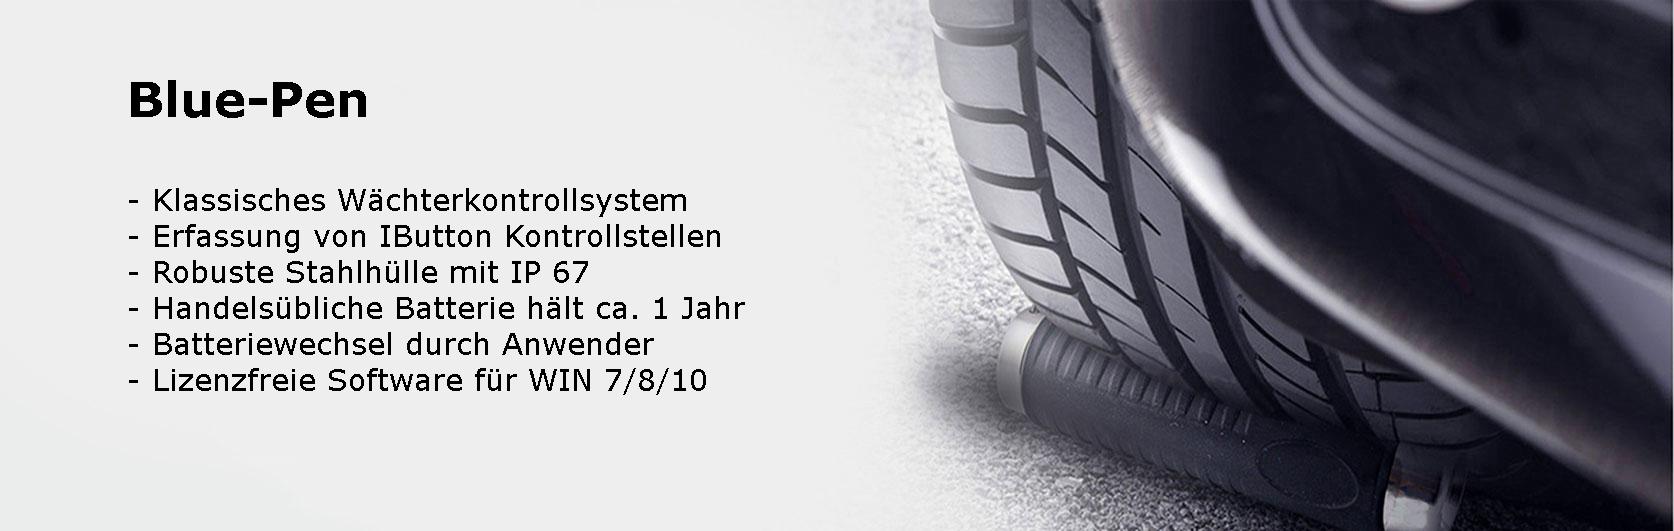 Slider-Blue-Pen Wächterkontrollsystem